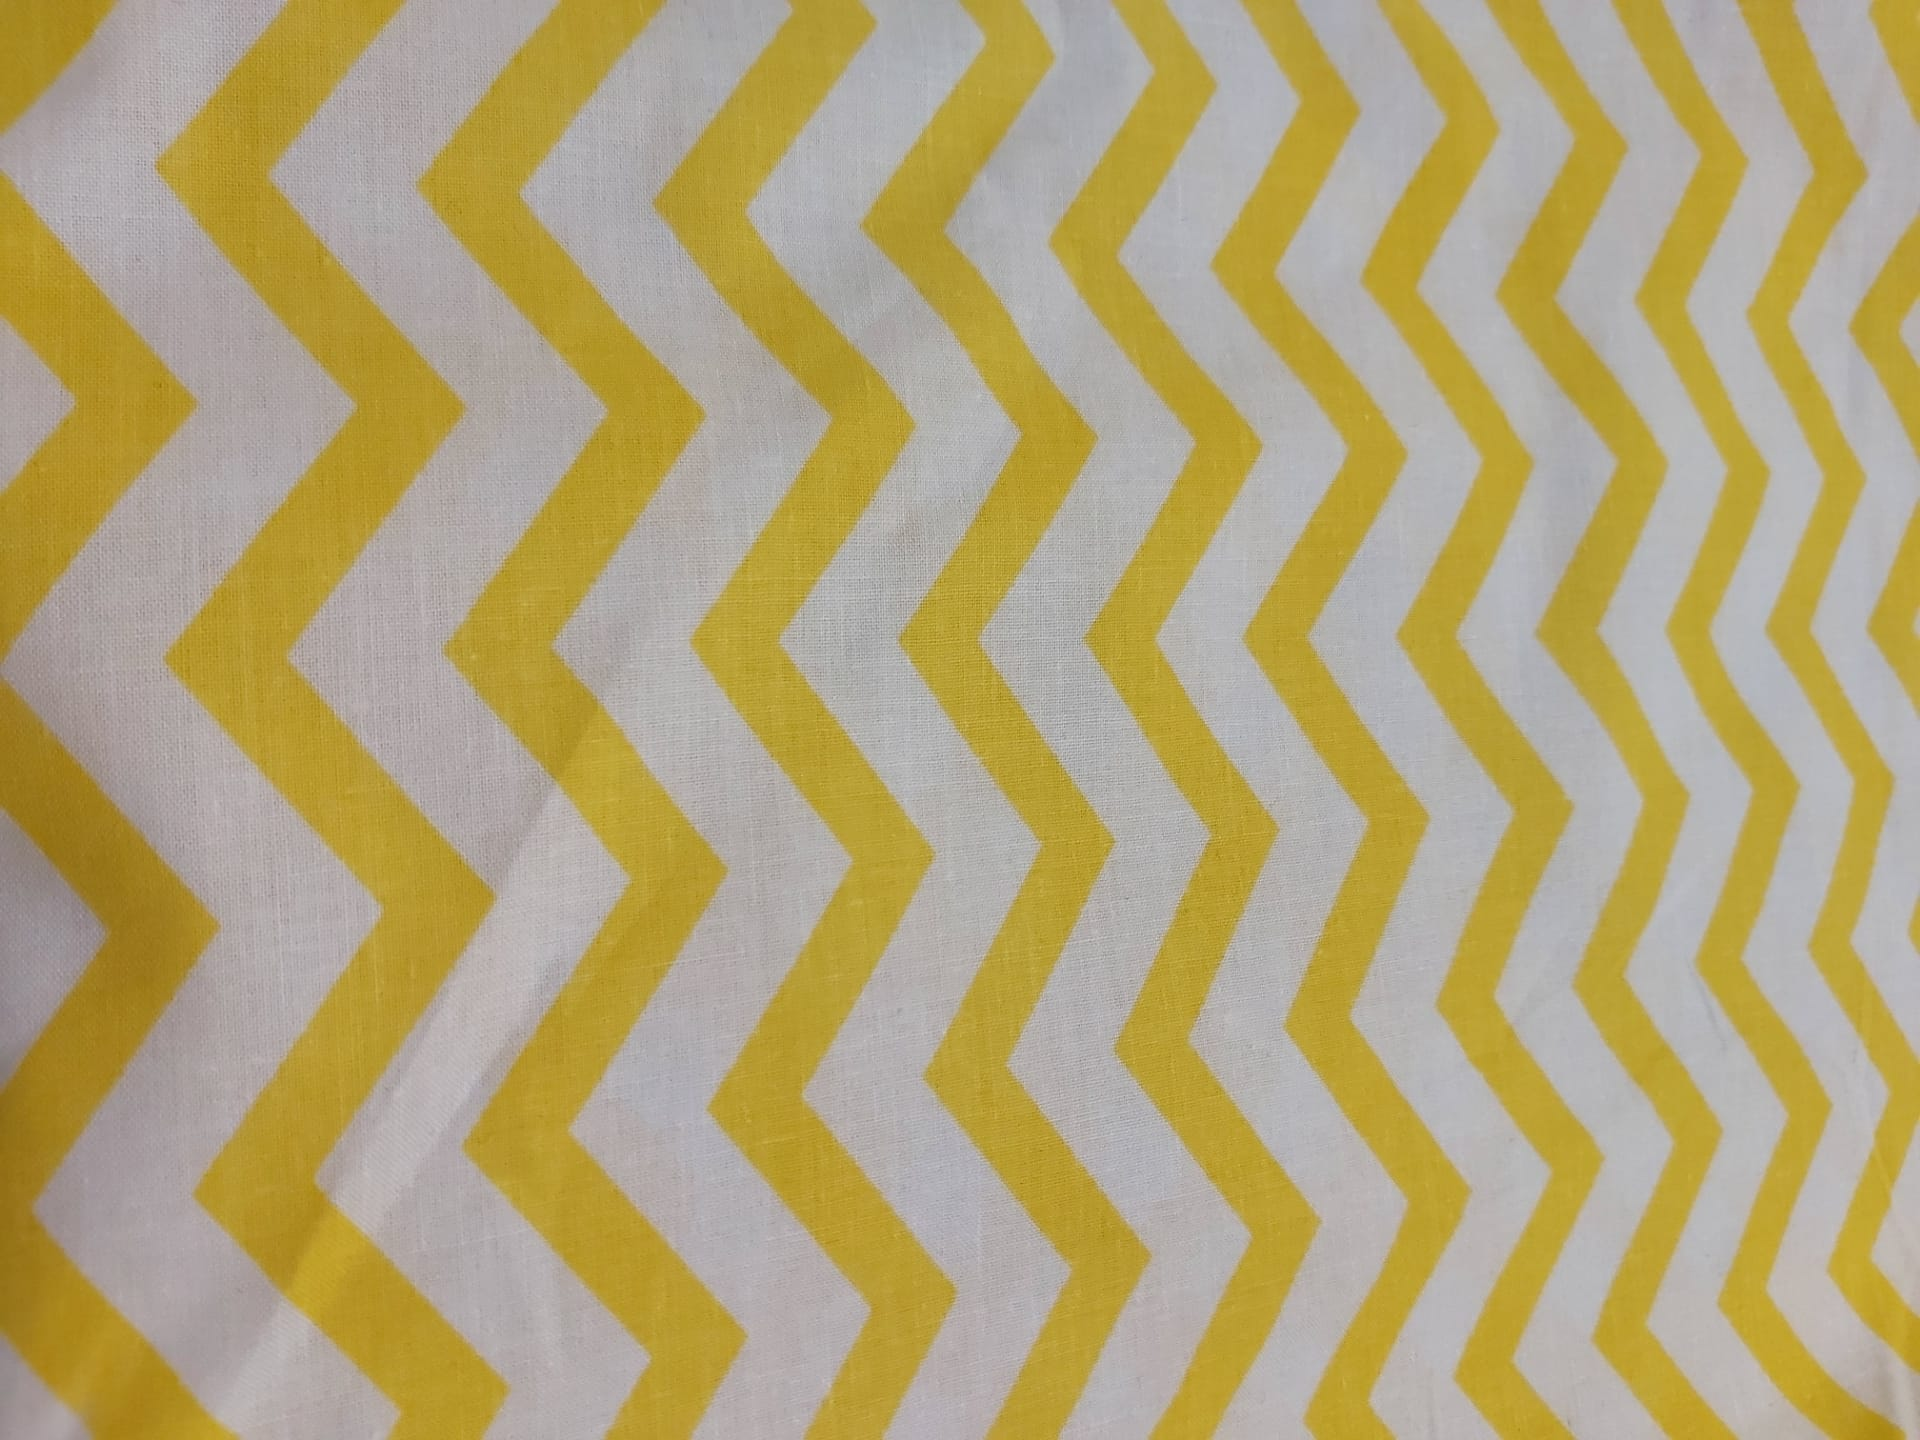 Tecido Zig-Zag Amarelo